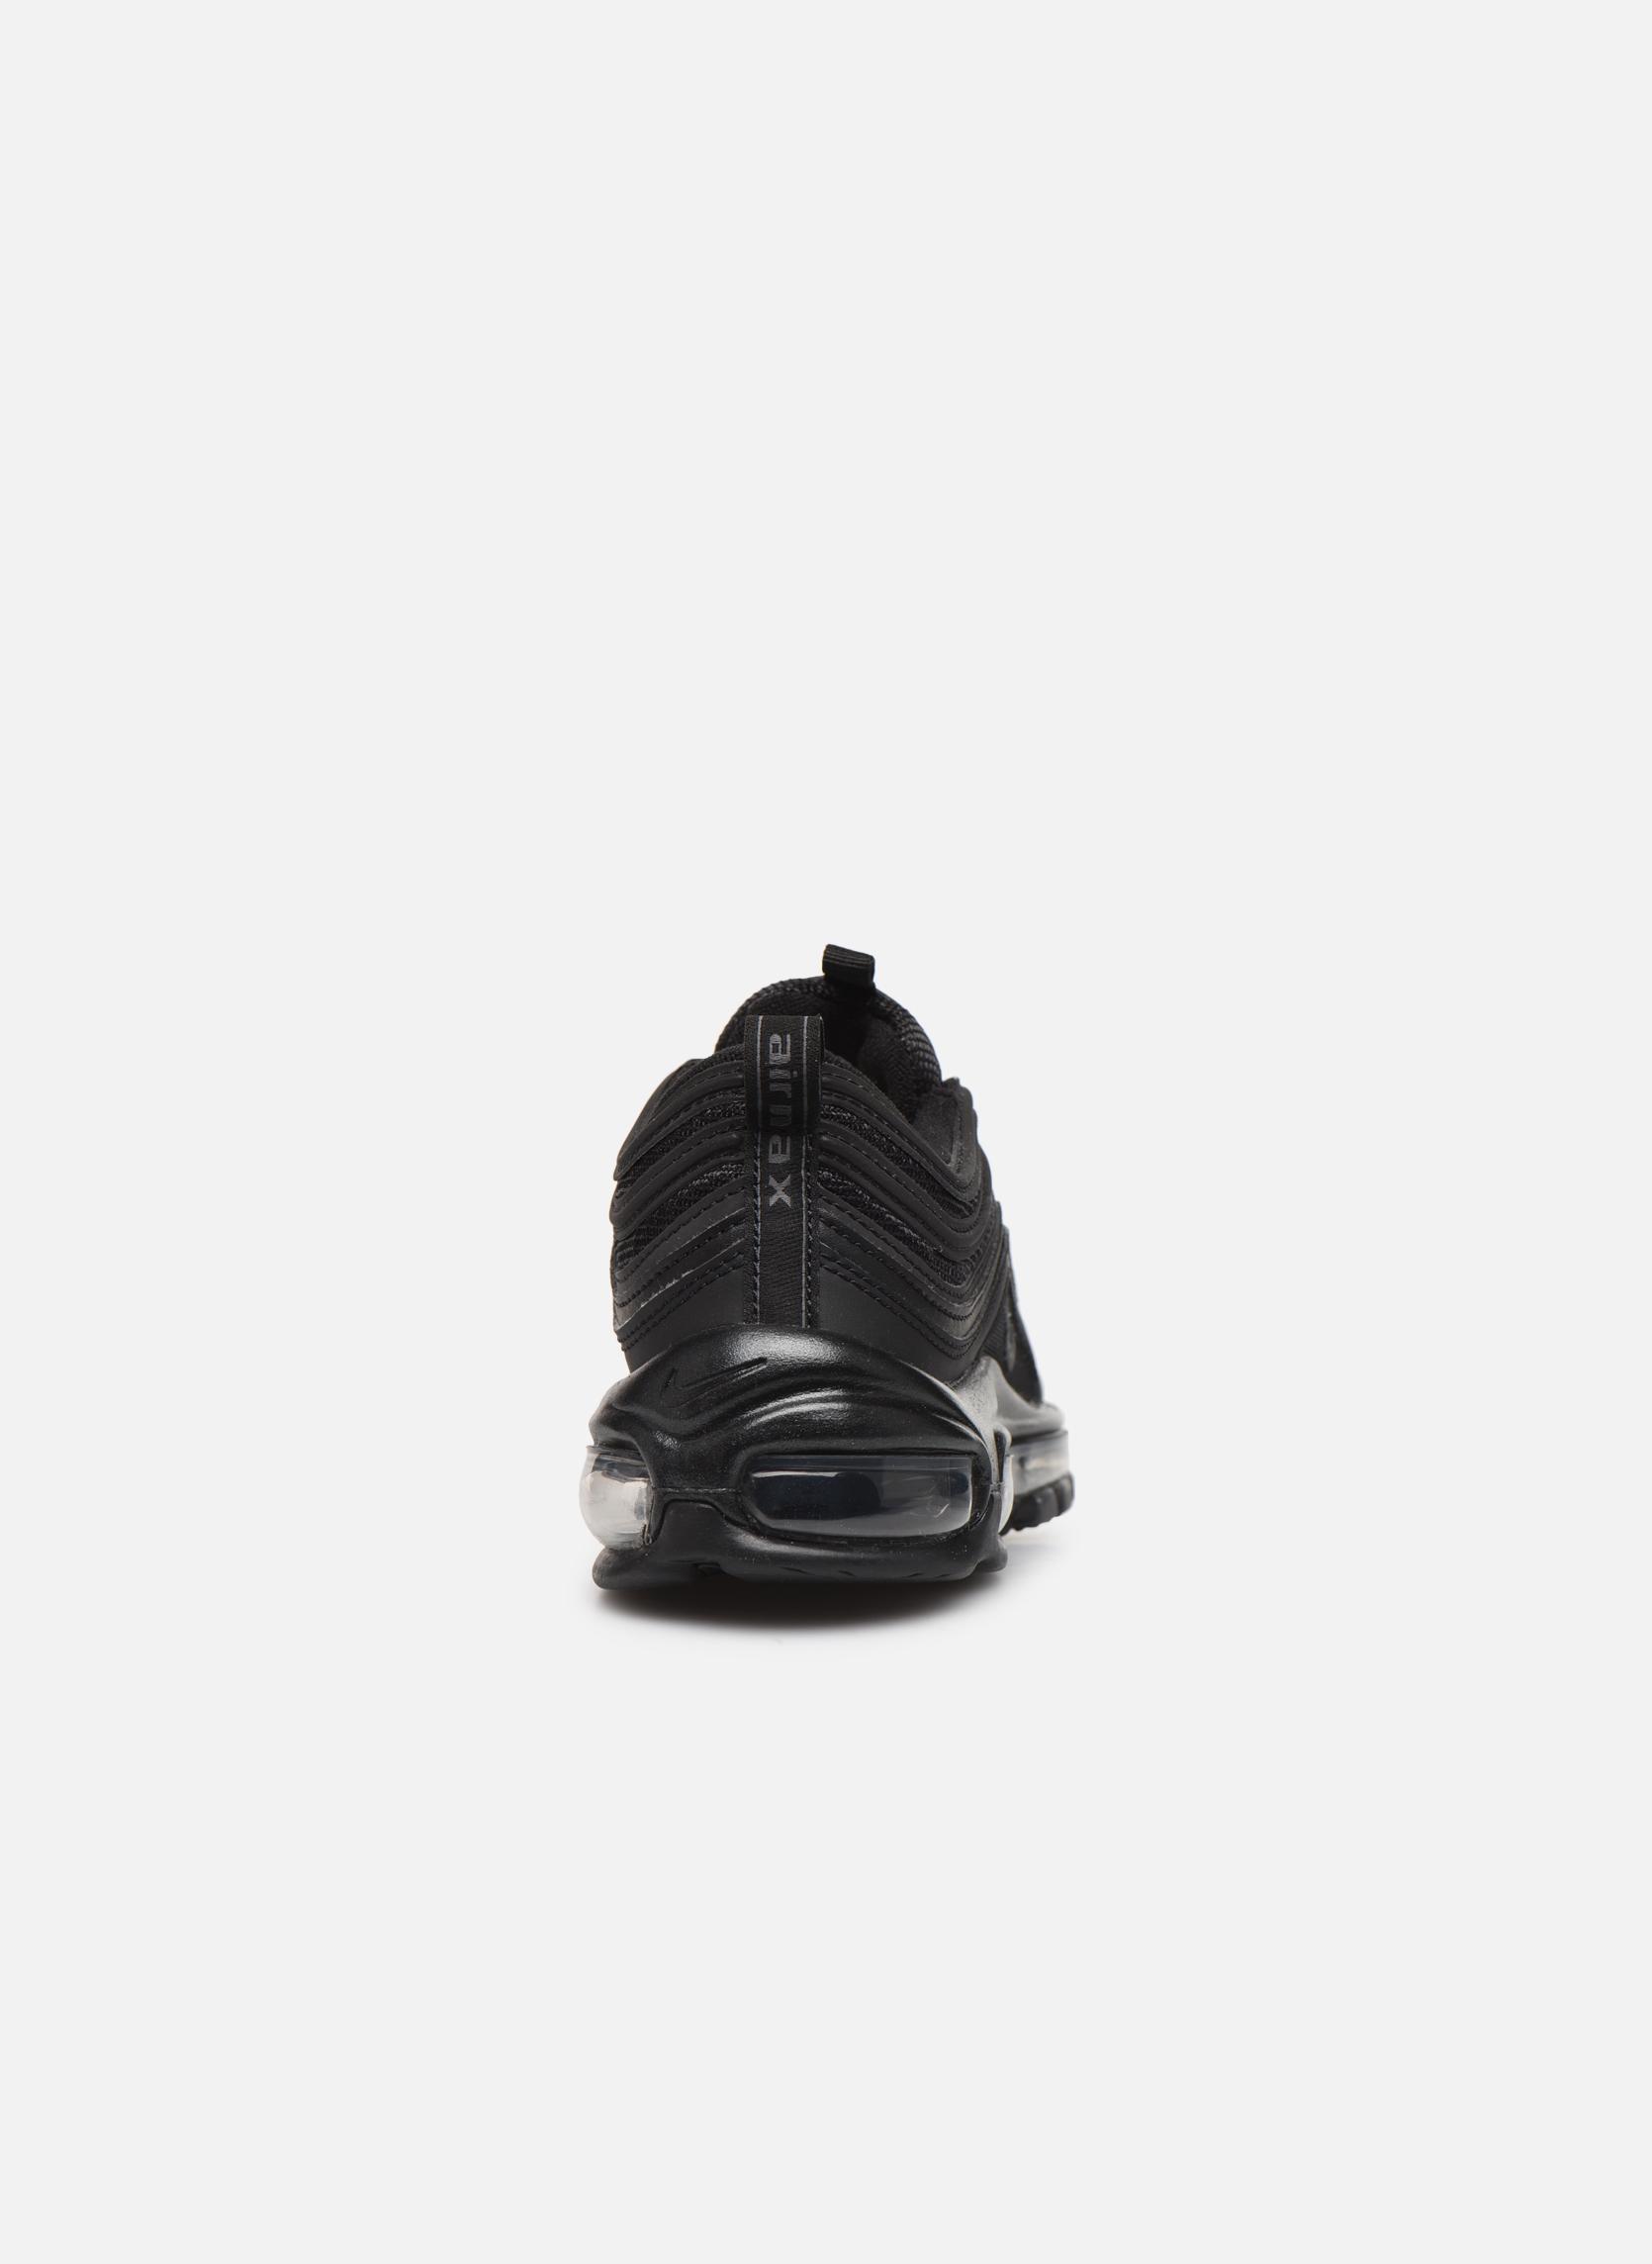 W Air Max 97 Black/black-Dark Grey